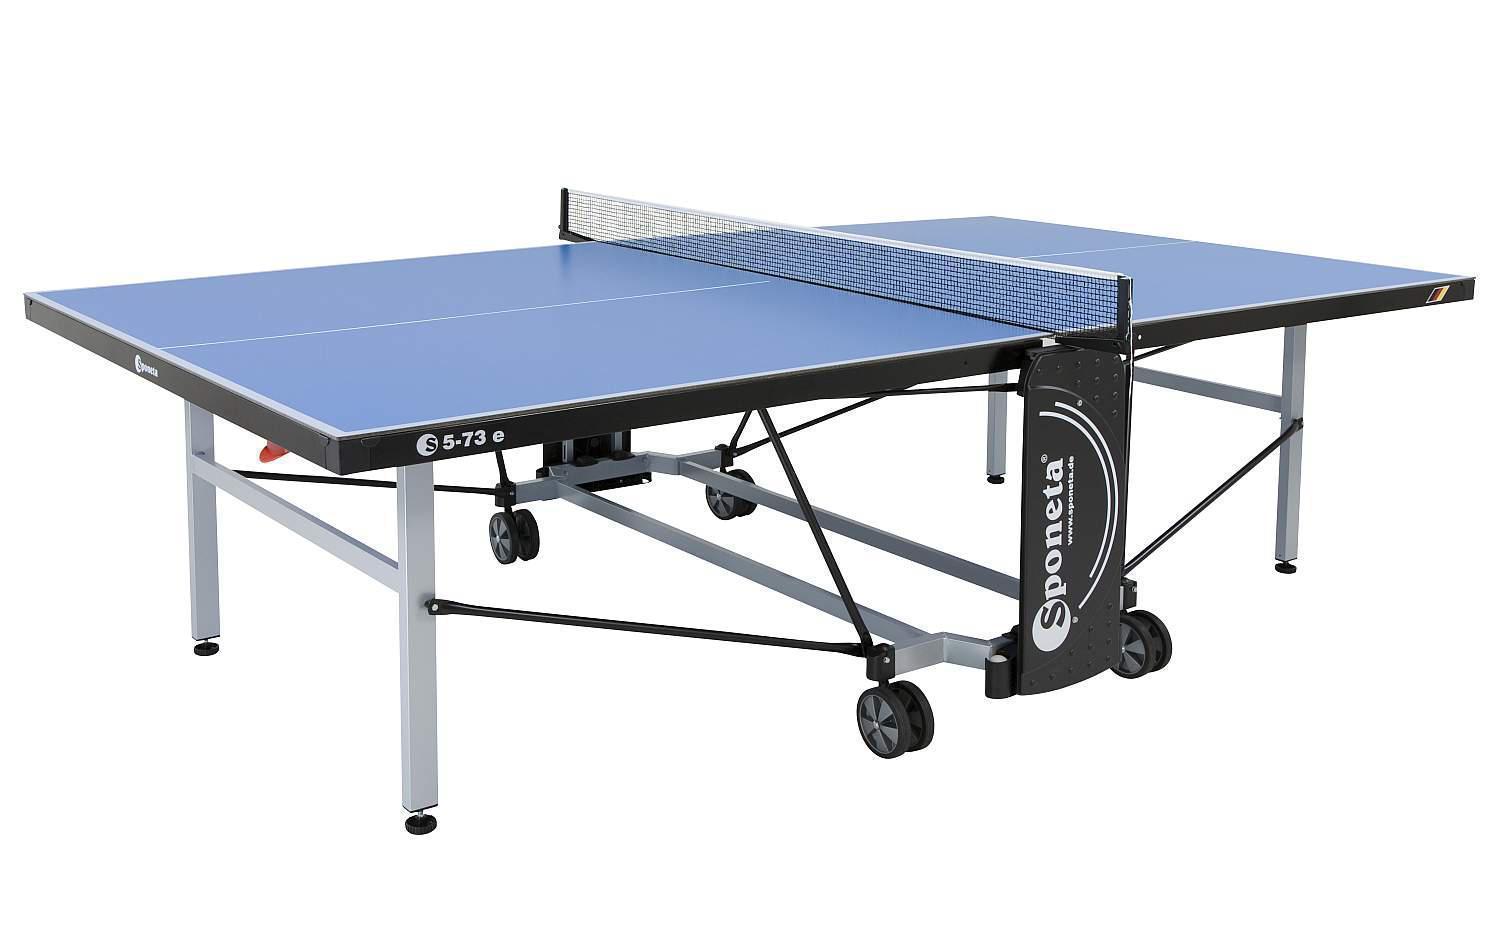 sponeta 5-72e / 5-73e / 5-70e | familien modelle | tischtennis.biz